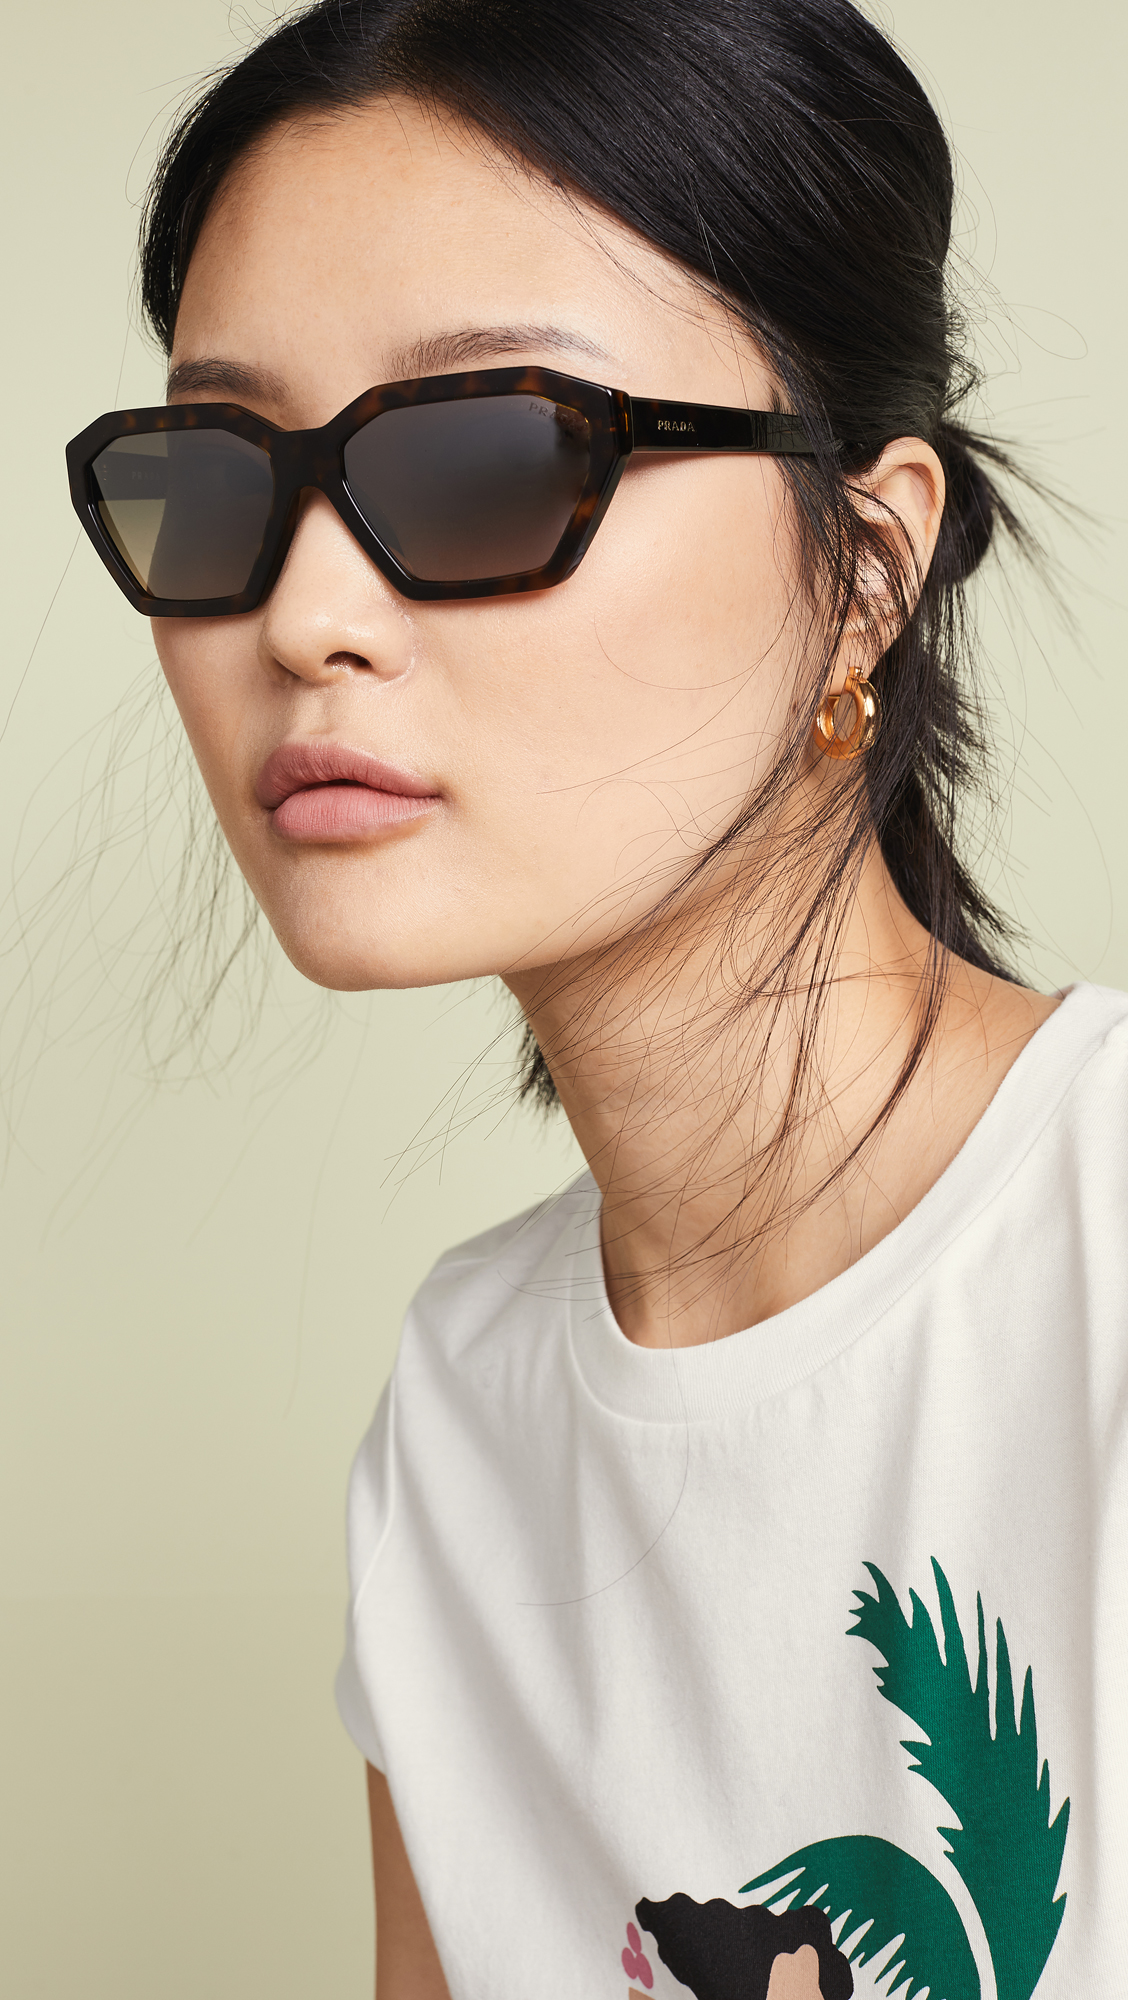 93b9c7d0be25a Prada PR 03VS Millennial Geometric Sunglasses